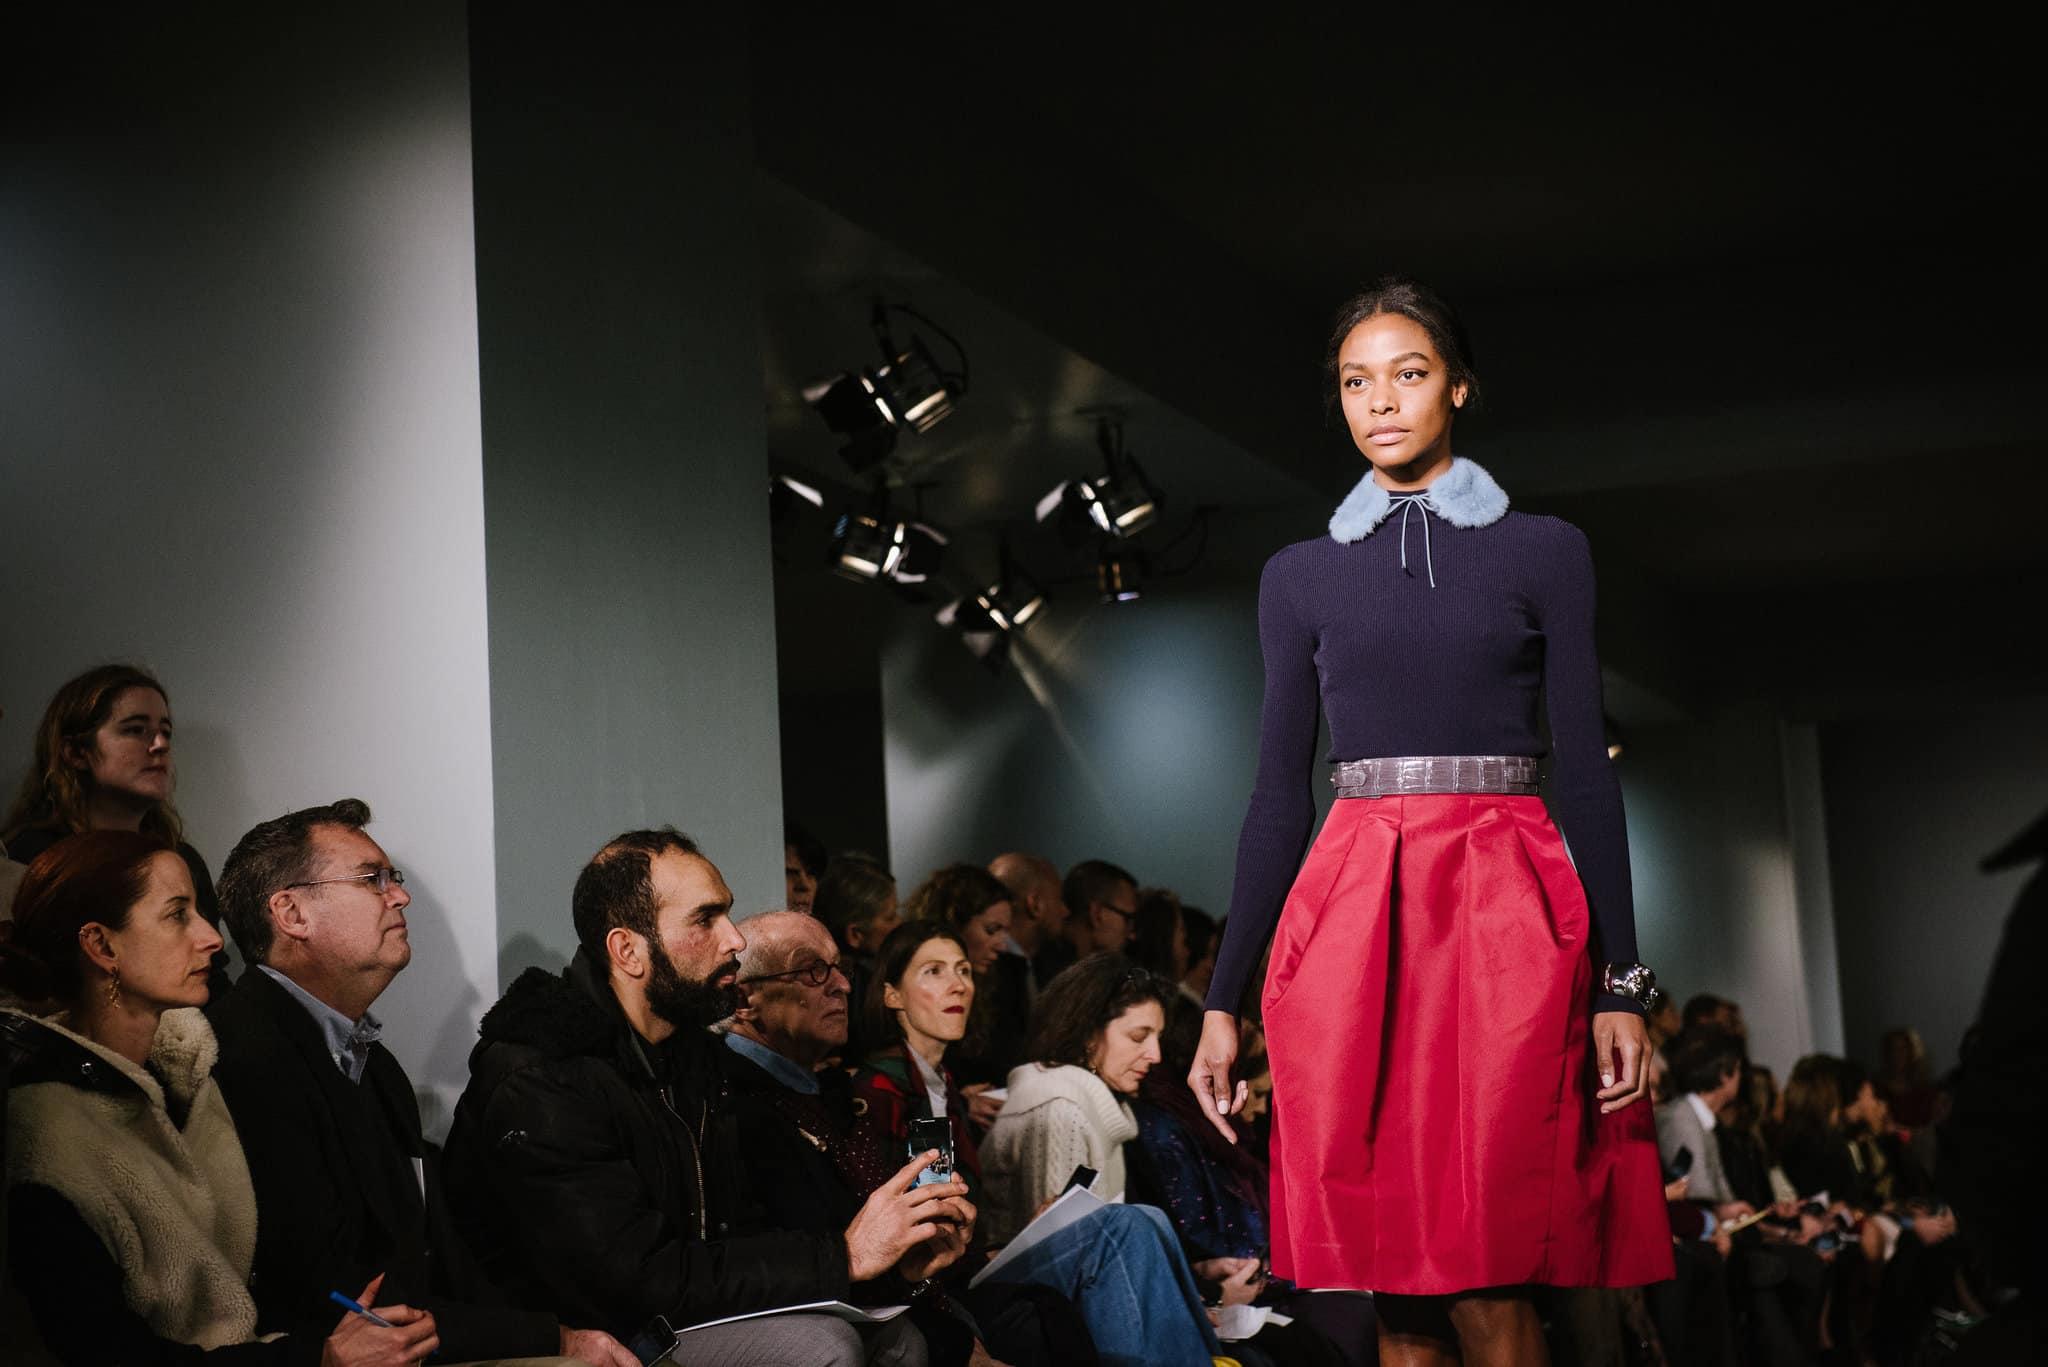 oscar-de-la-renta-hot-pink-skirt-navy sweater-cococozy-nyt